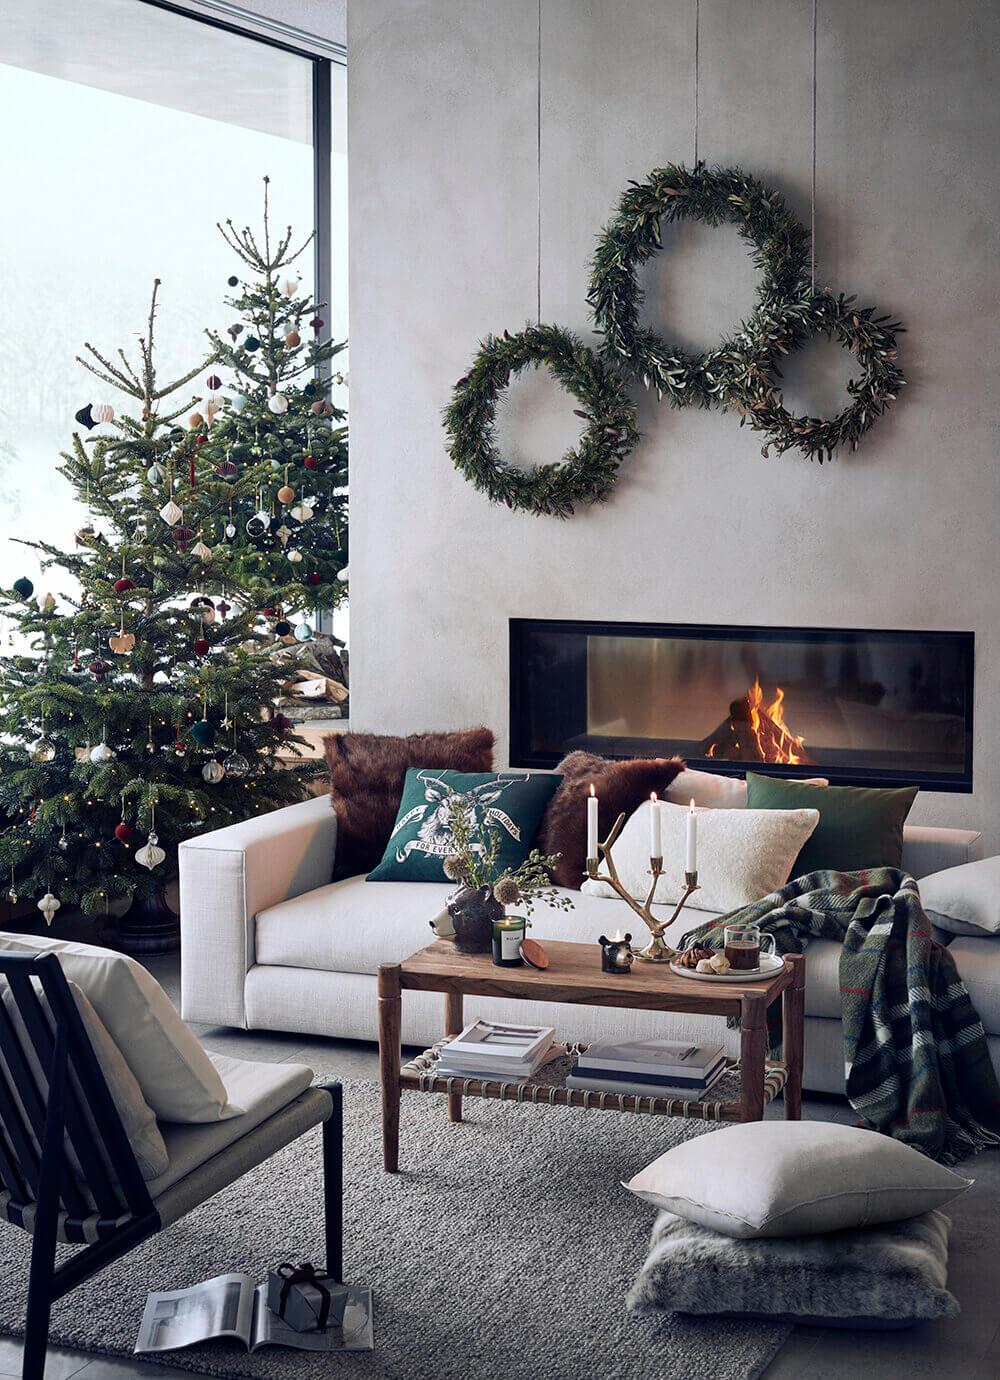 H&M Home Christmas Collection 2019